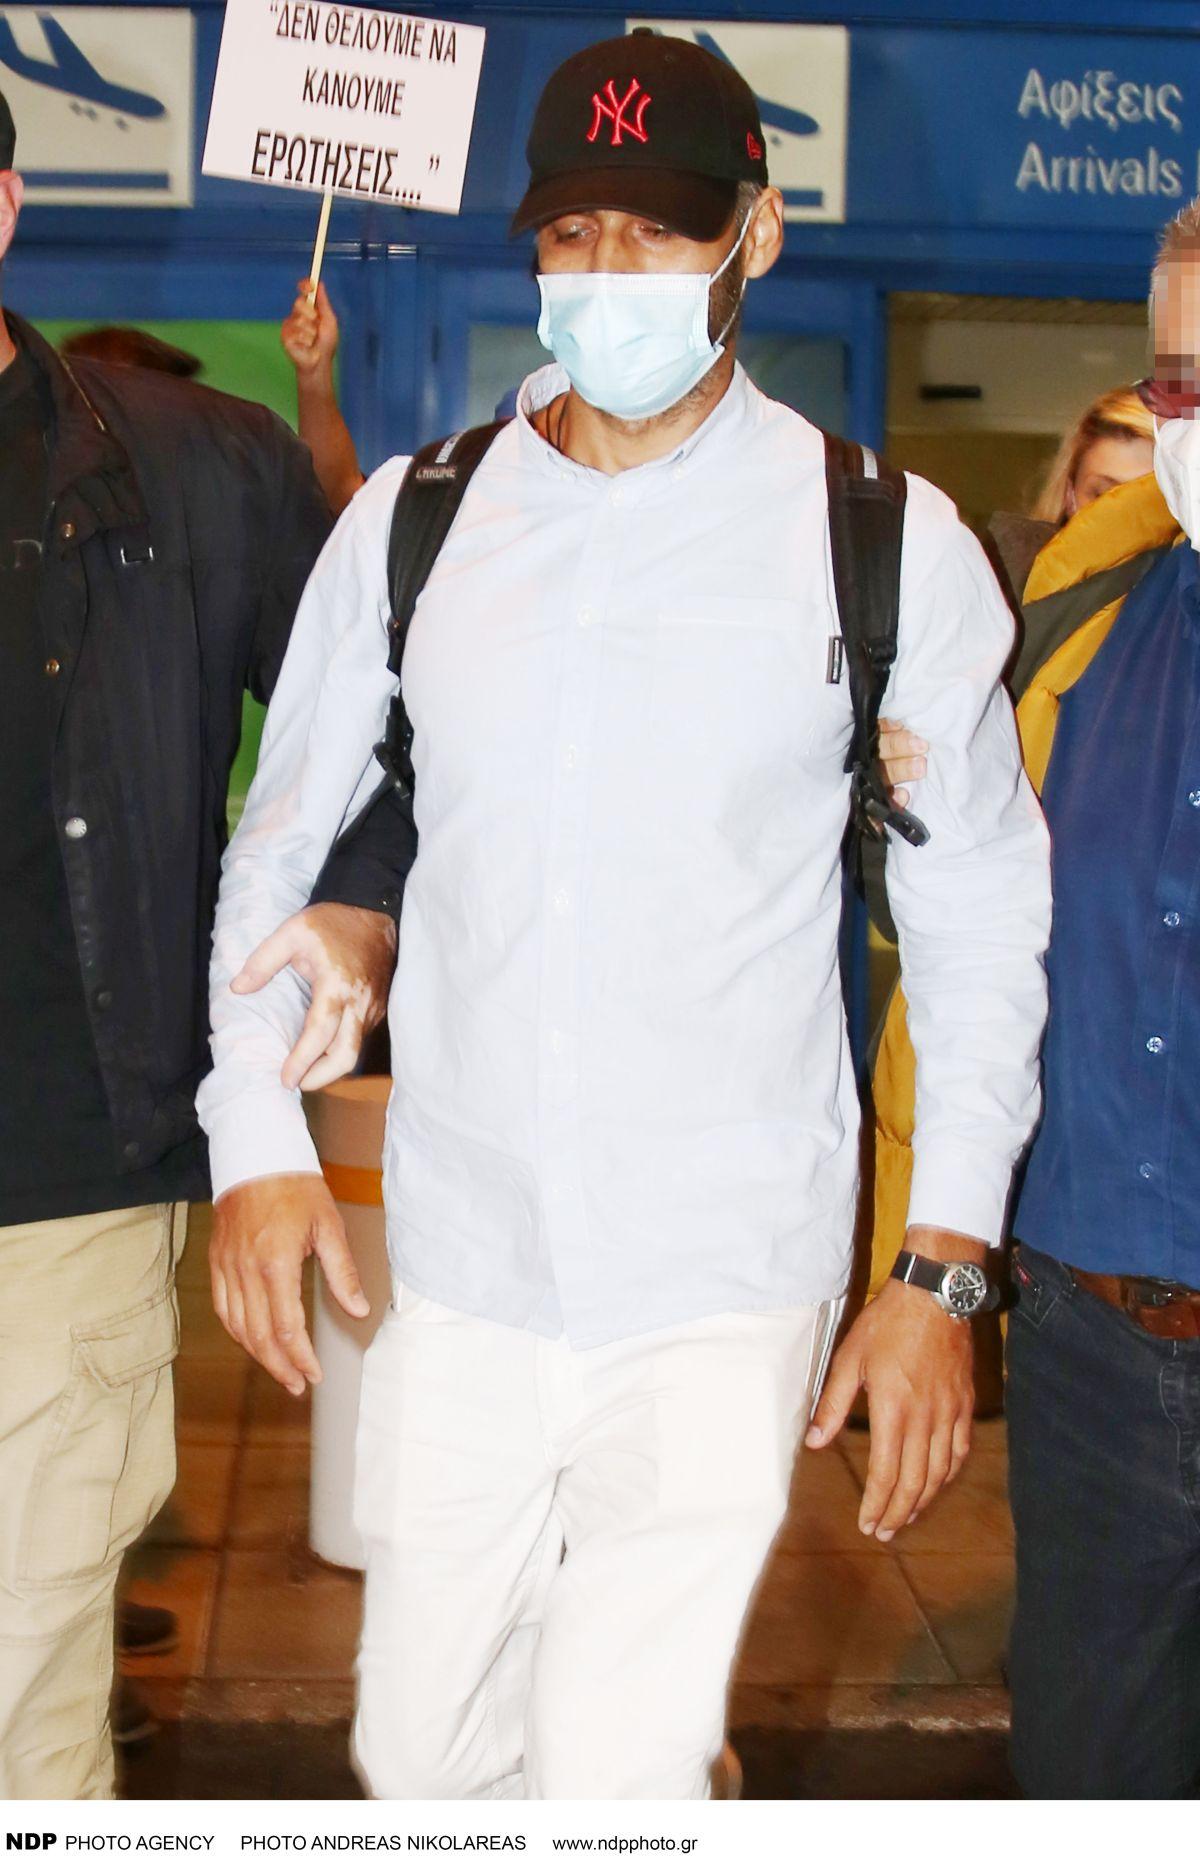 Survivor 4 - Αλέξης Παππάς: η επιστροφή στην Ελλάδα και τα παρατράγουδα στο αεροδρόμιο